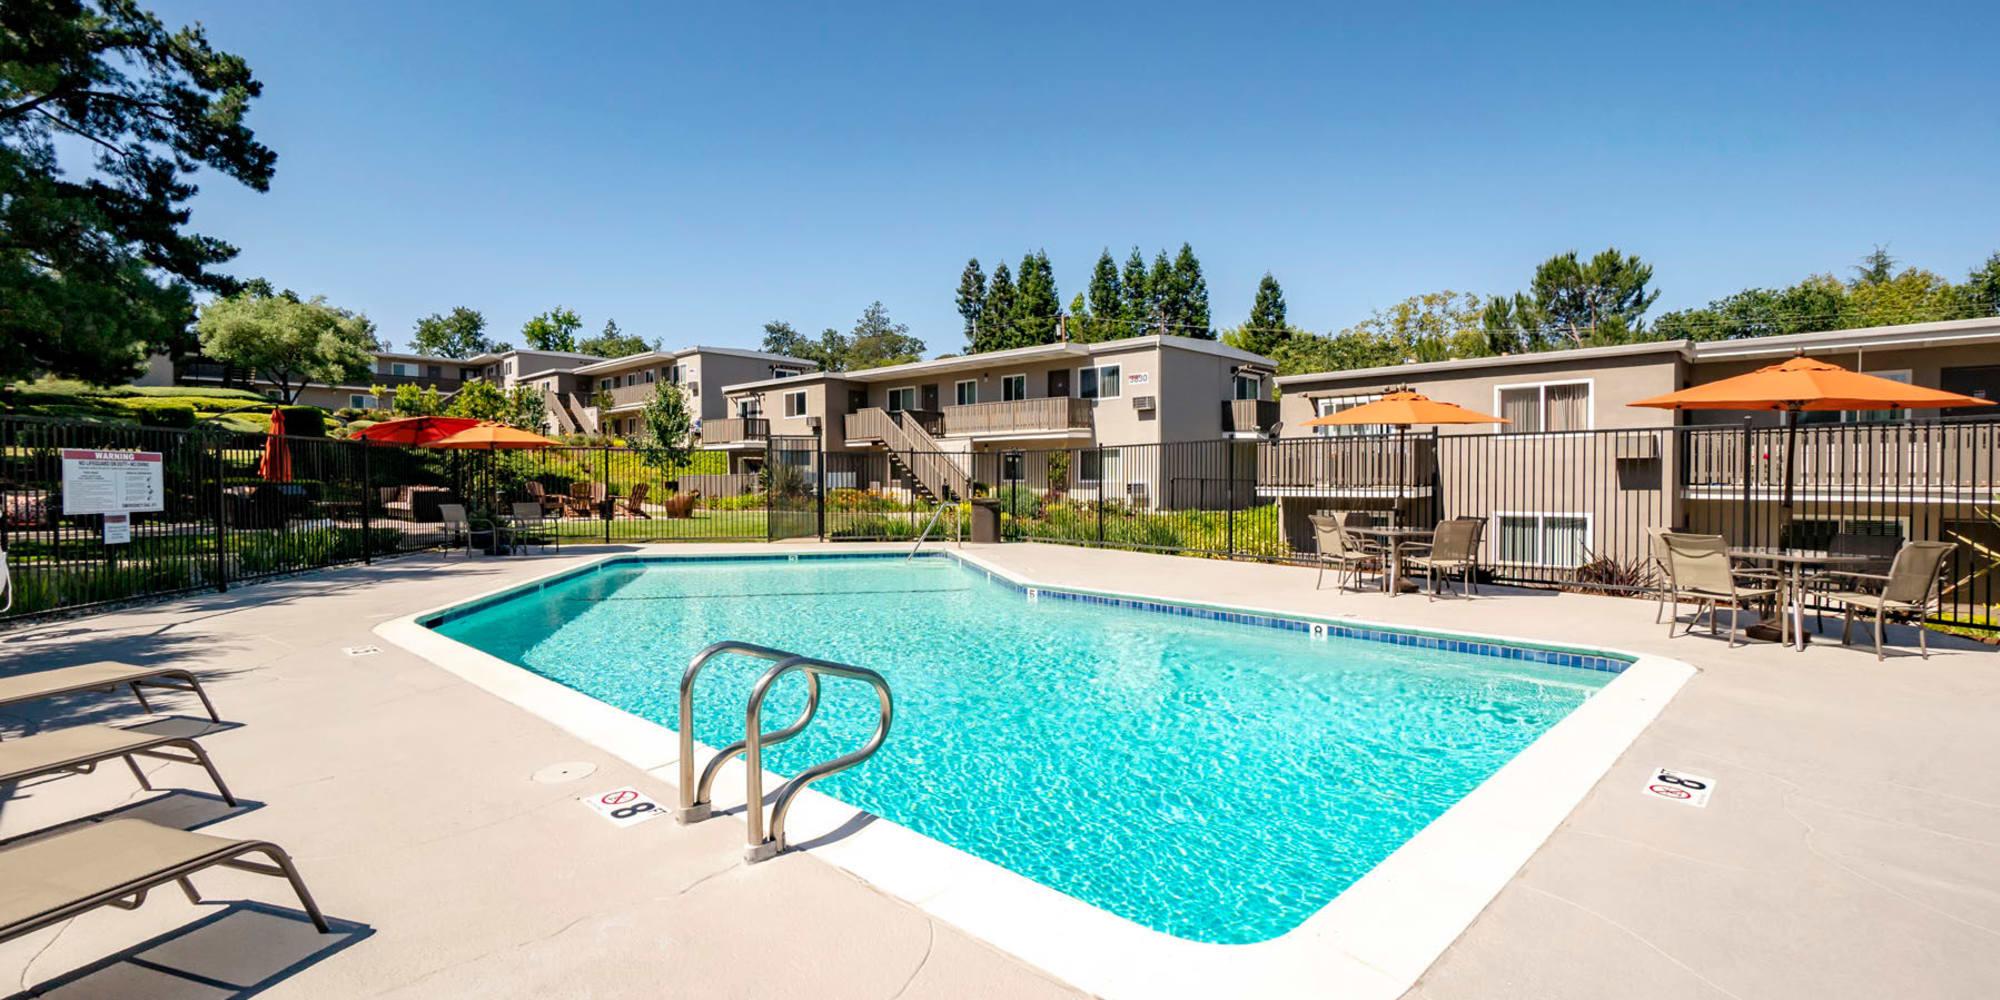 Shaded seating near the swimming pool at Pleasanton Heights in Pleasanton, California